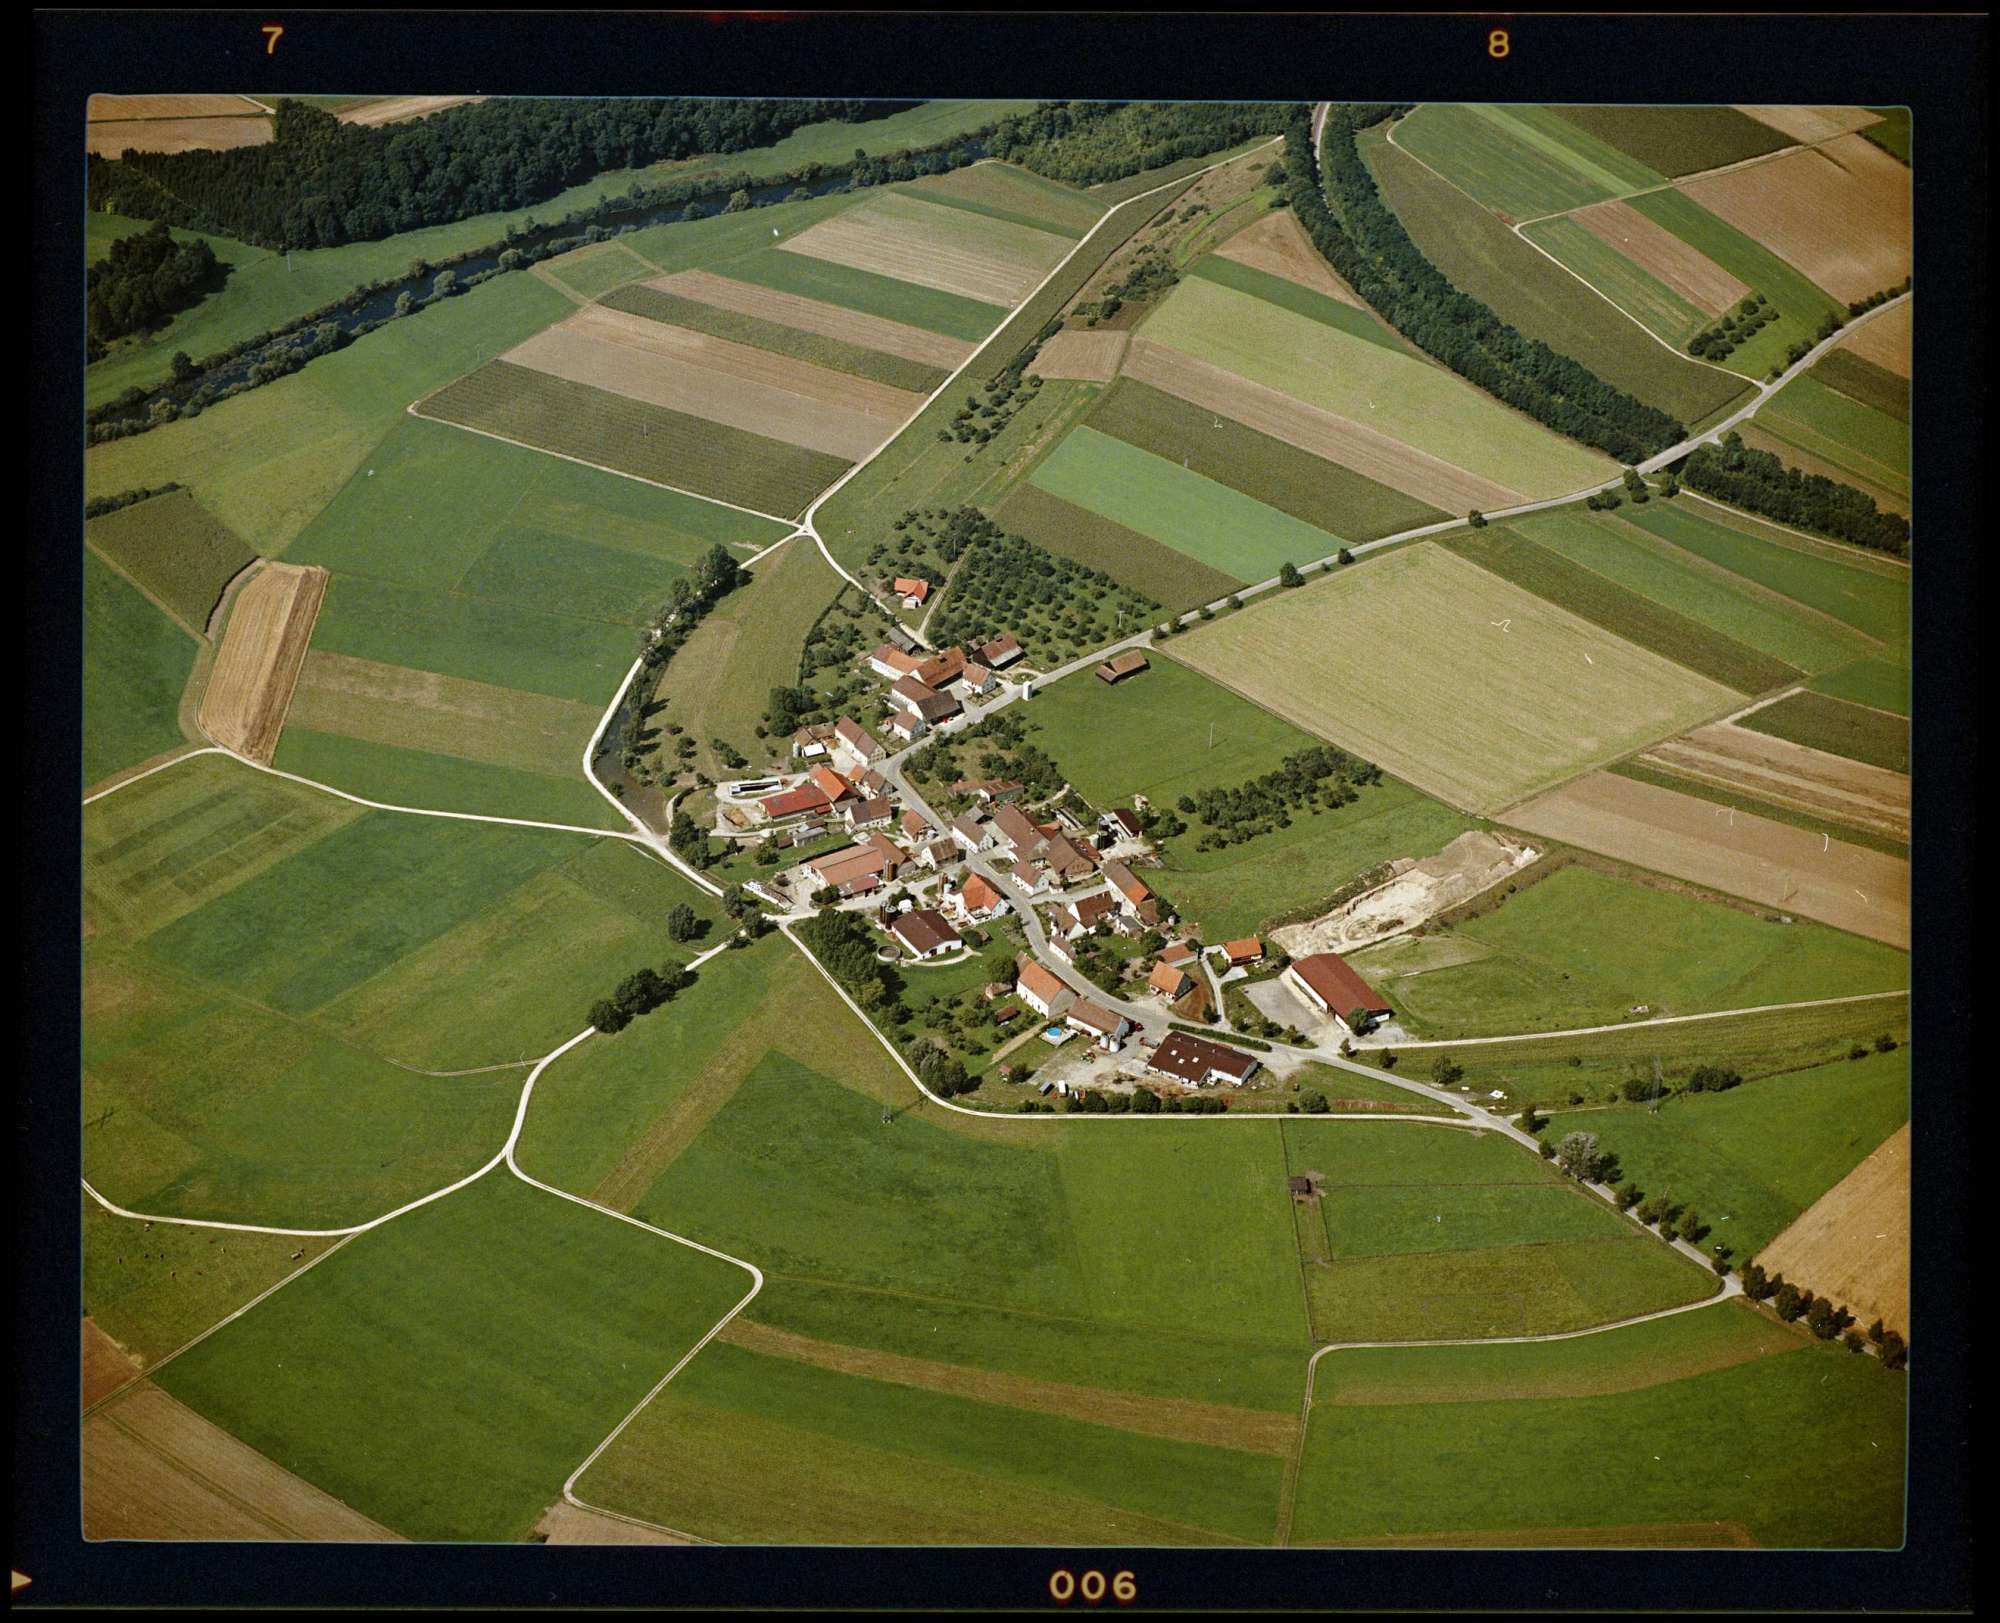 Algershofen, Luftbild, Bild 1